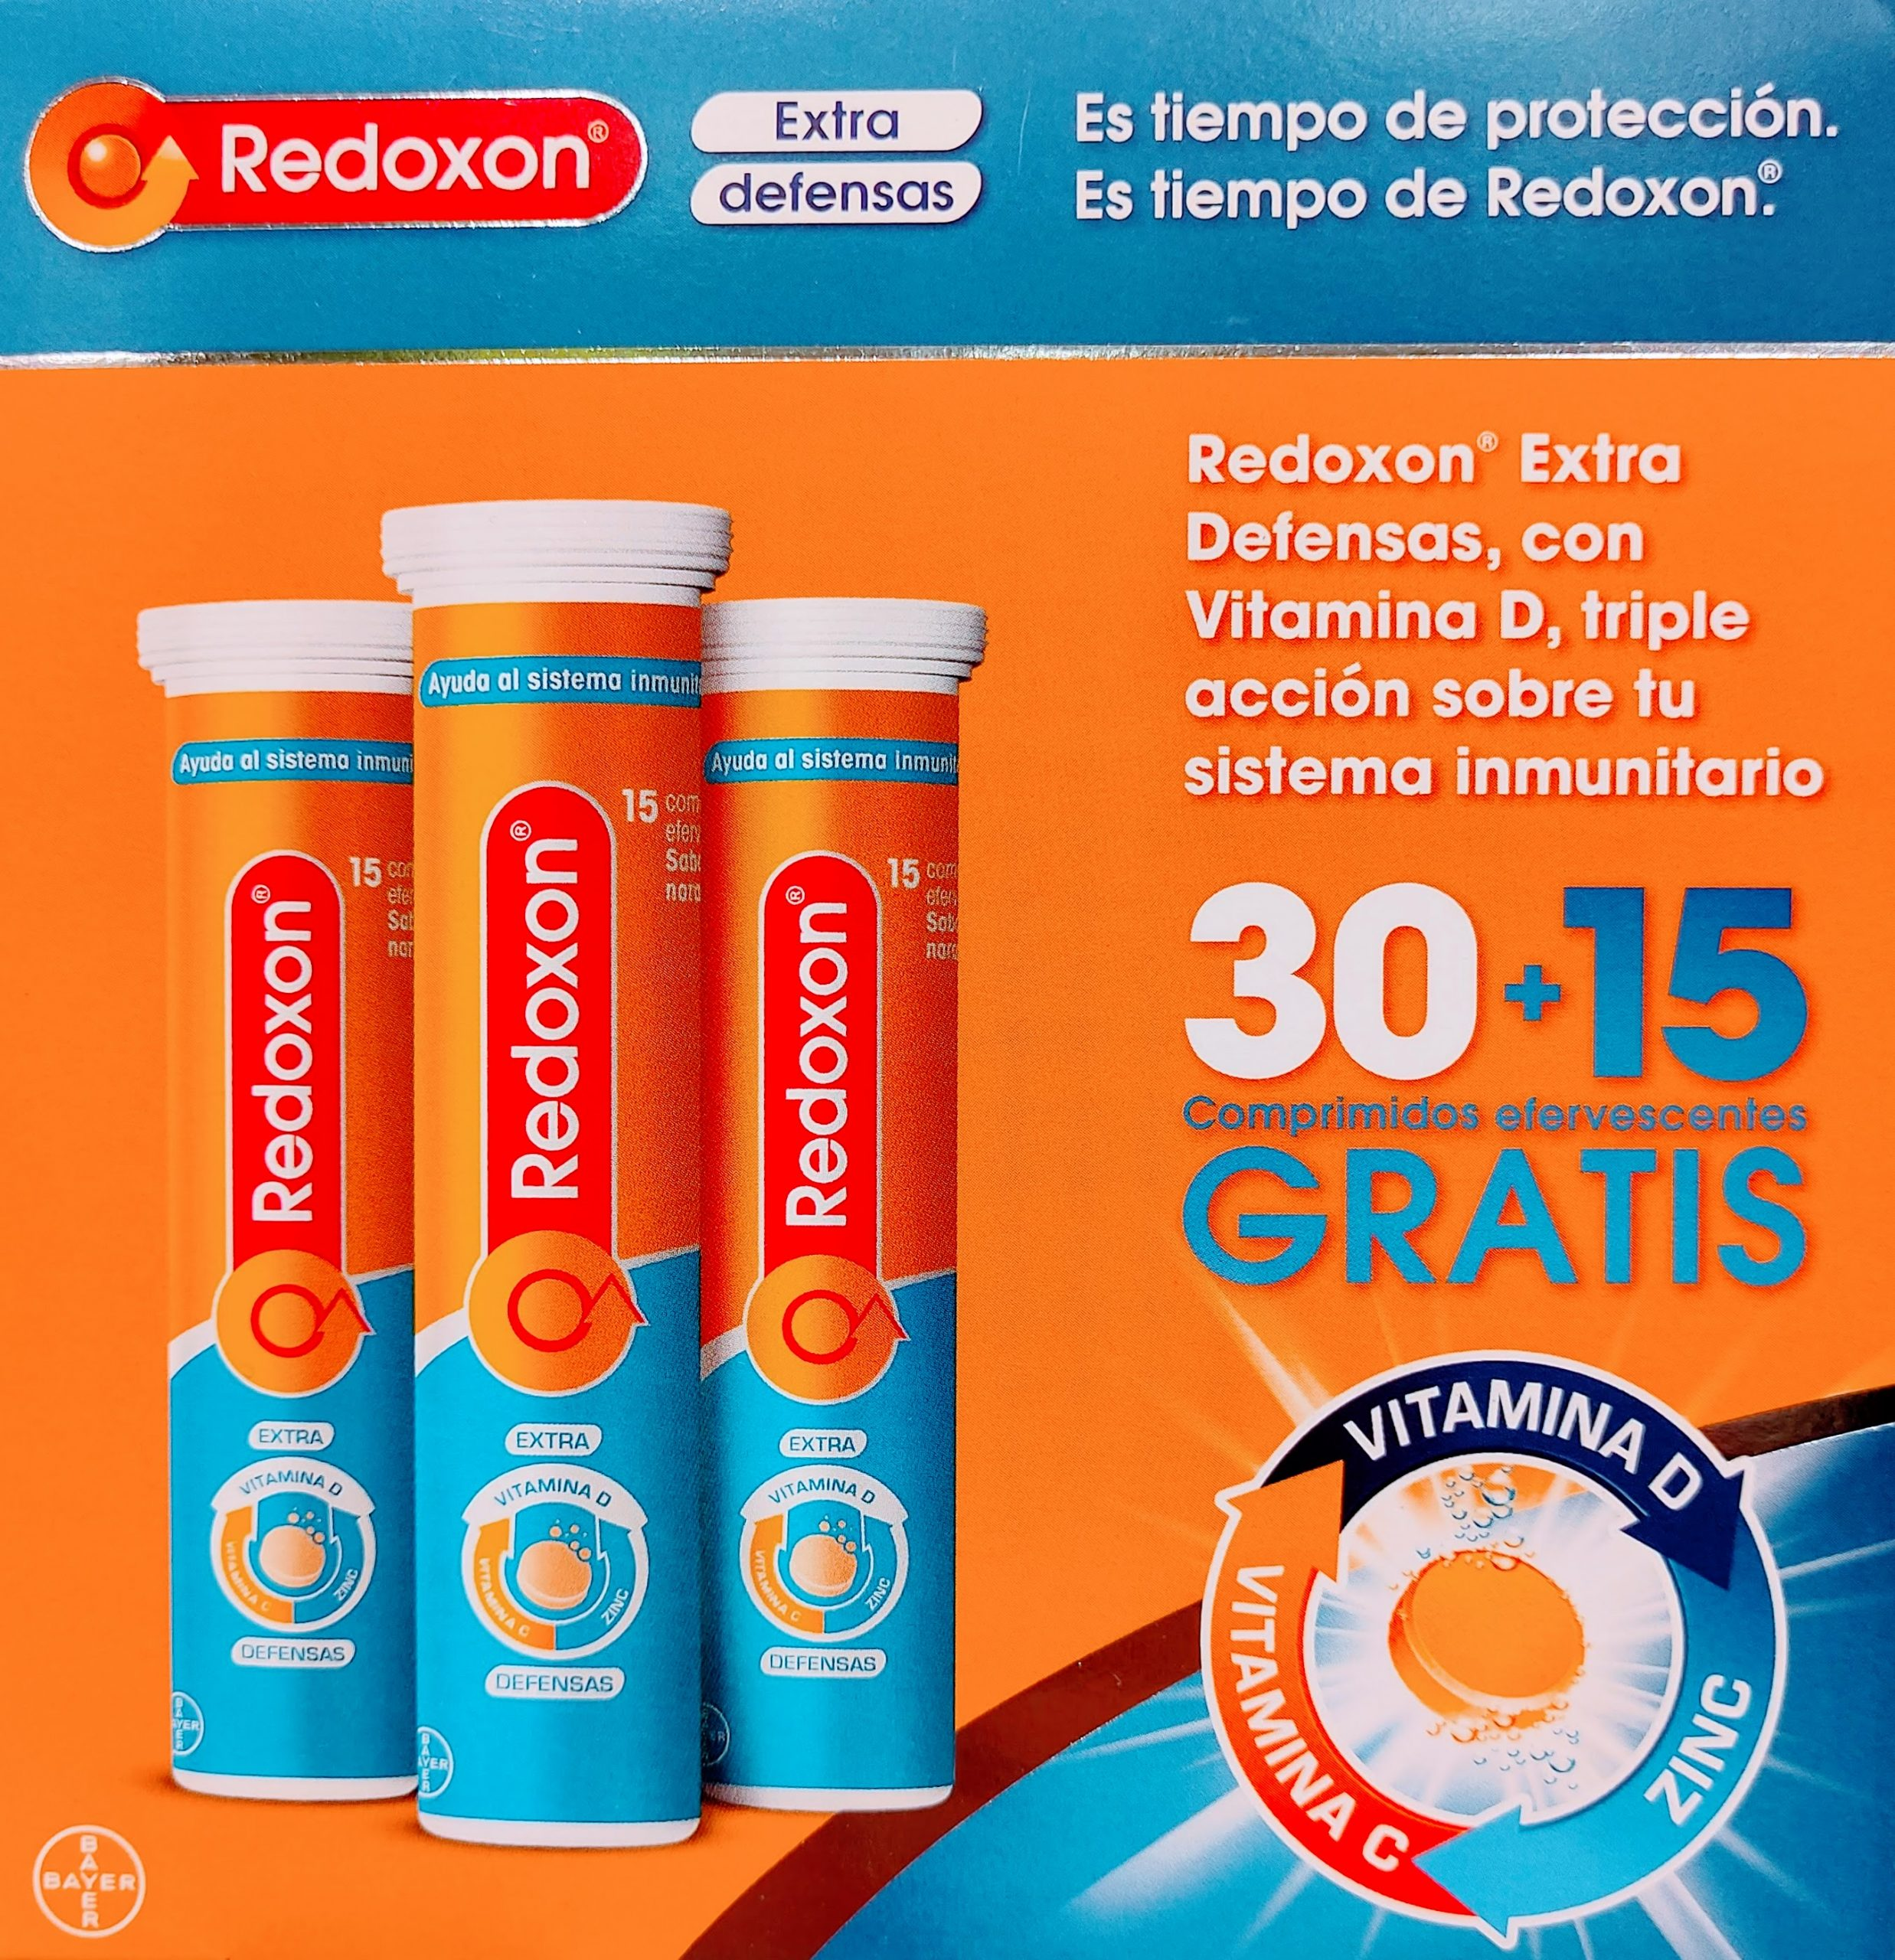 Redoxon Extra Defensas que combina Vitamina D, Vitamina C y Zinc para mejorar los tres niveles de defensa naturales del ser humano.